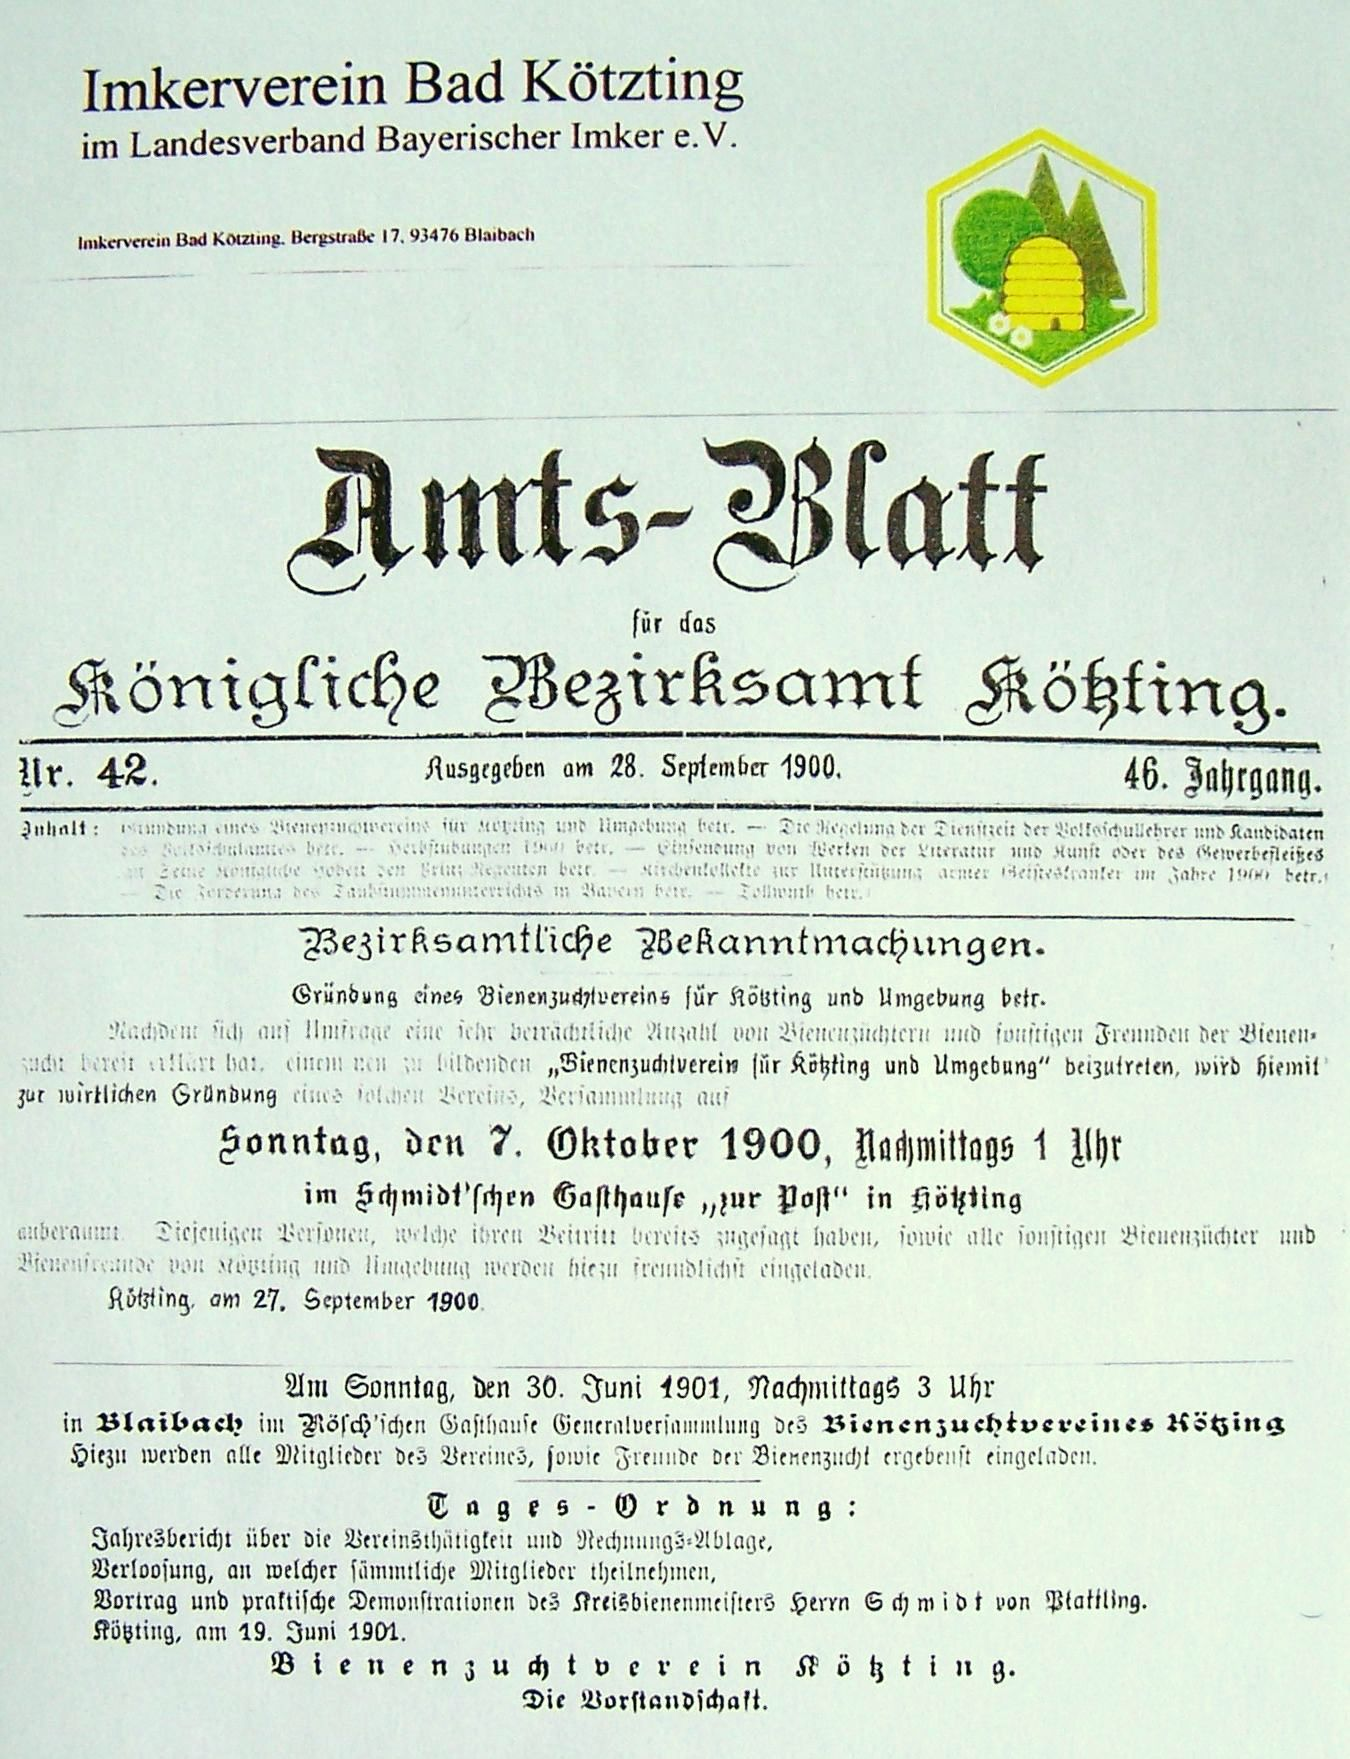 Amtsblatt zur Gründung des Vereins